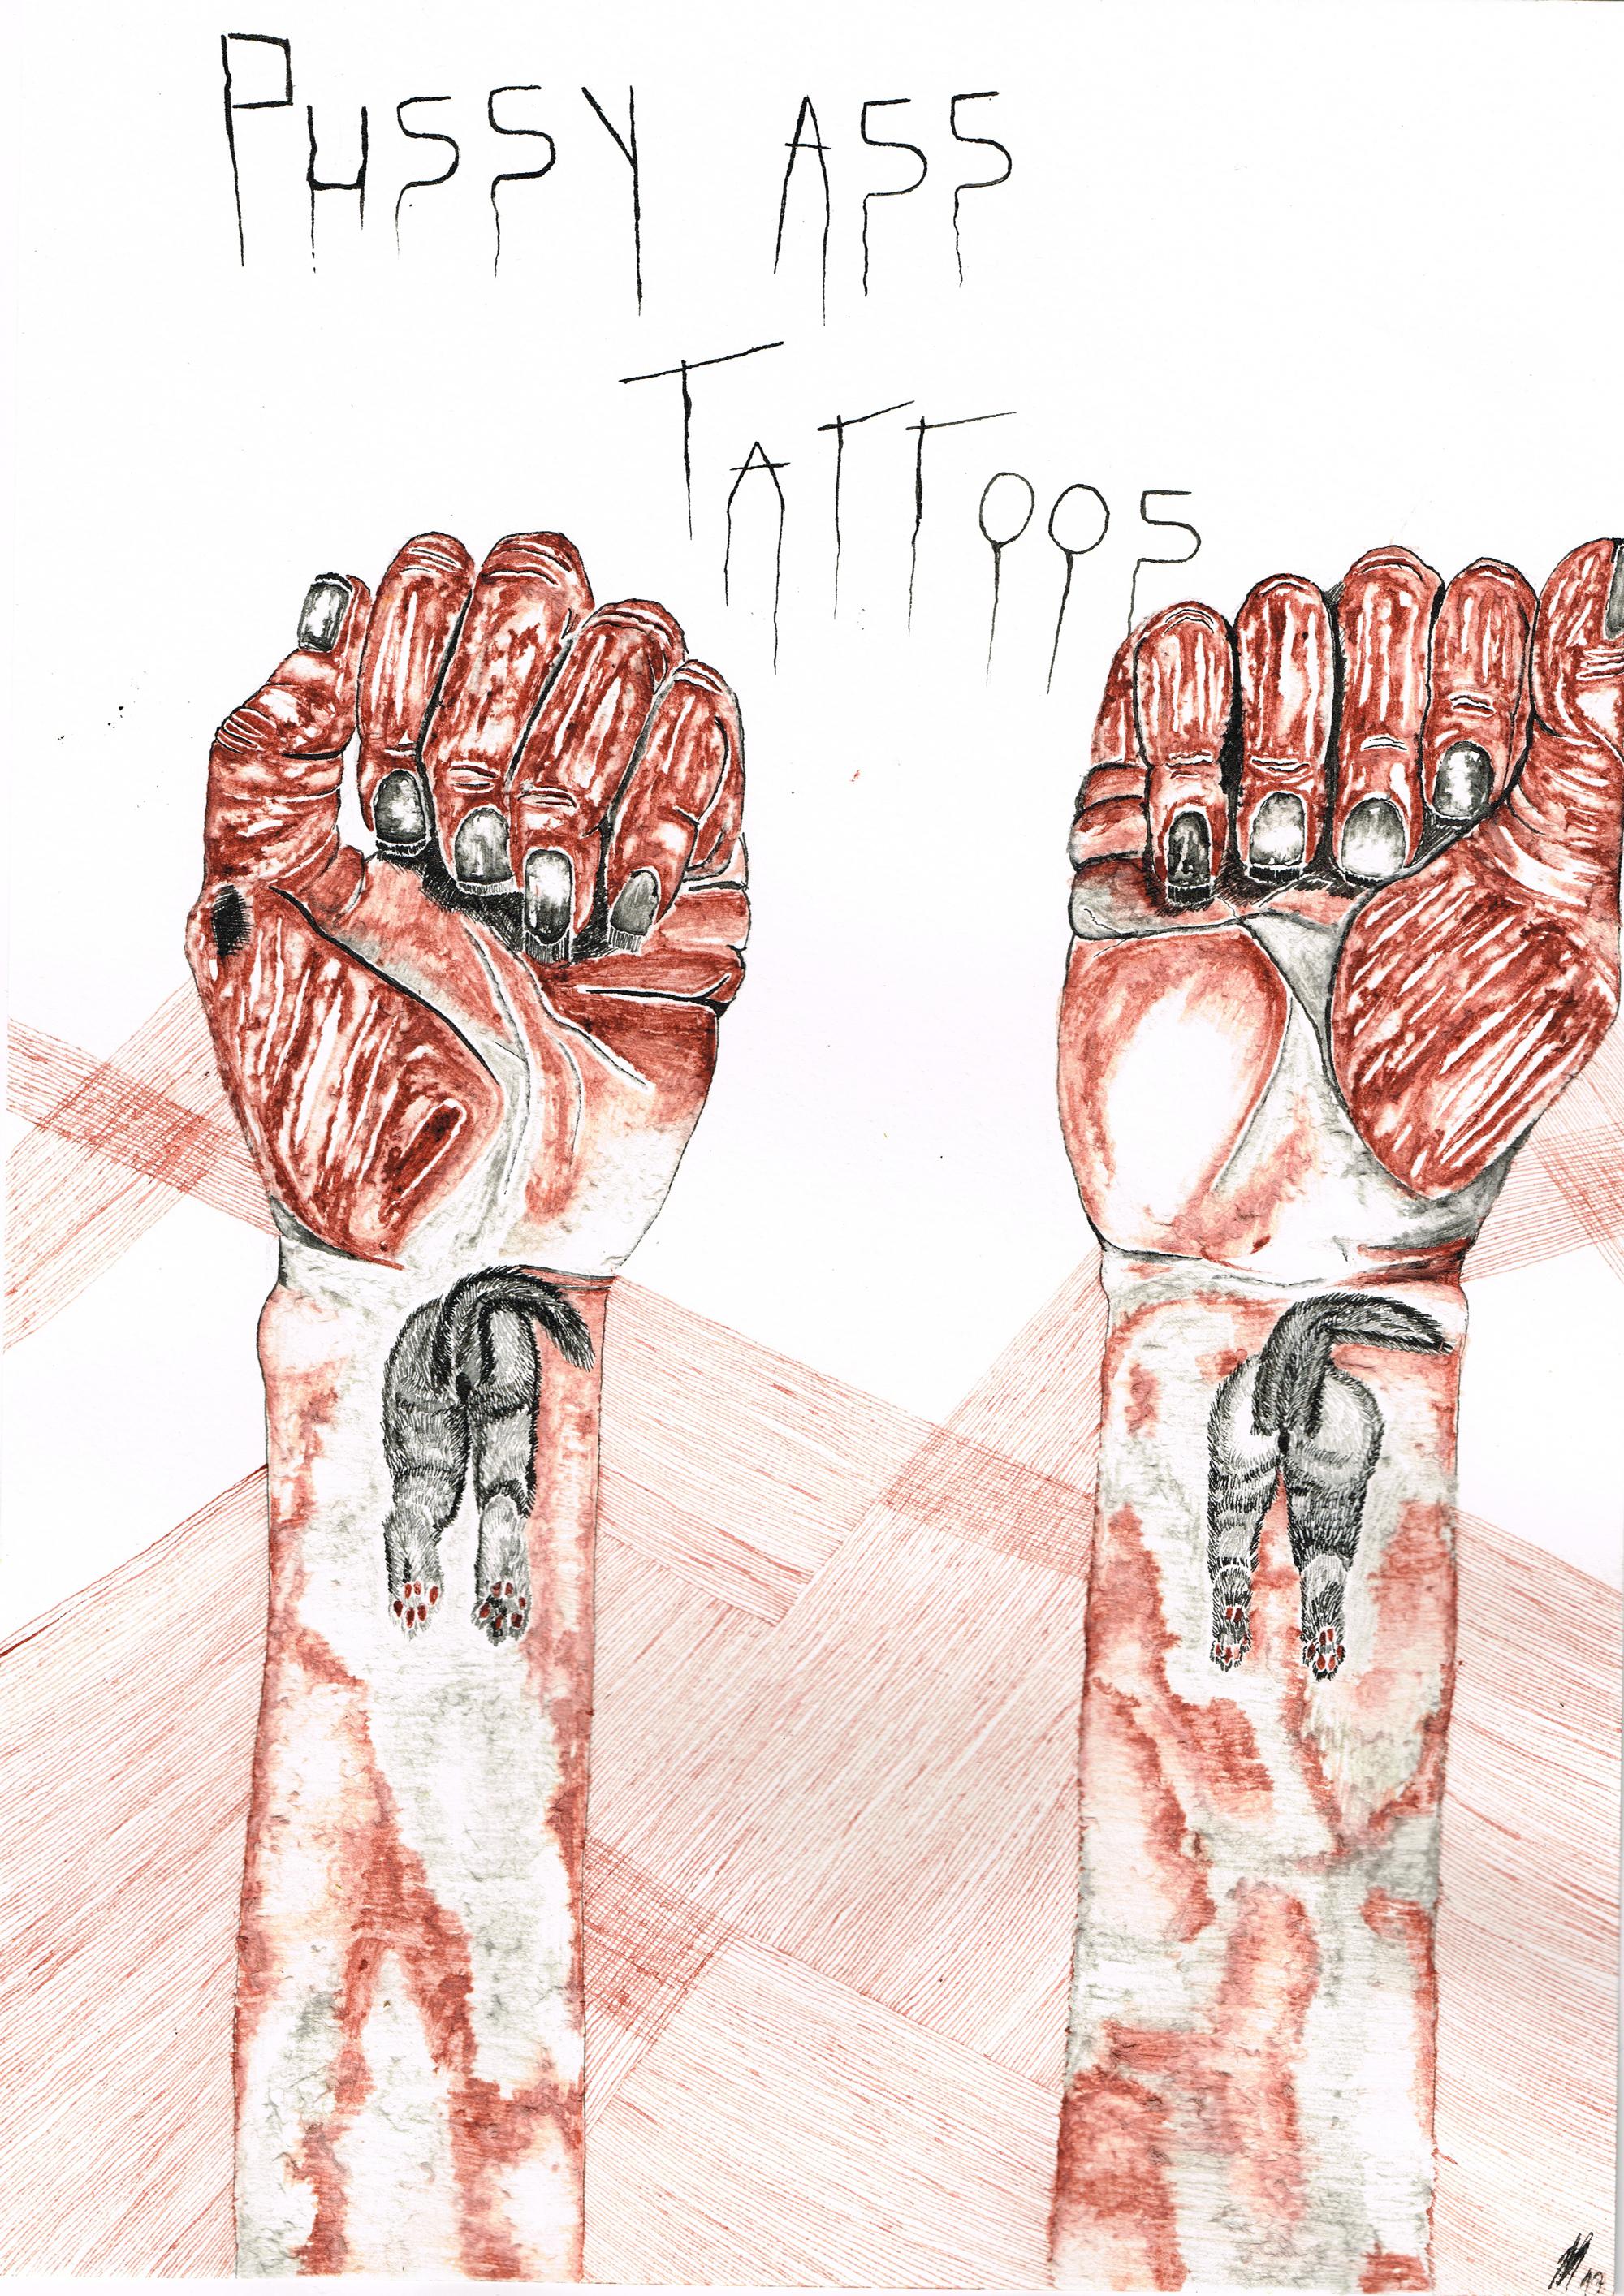 Pussy ass tattoos